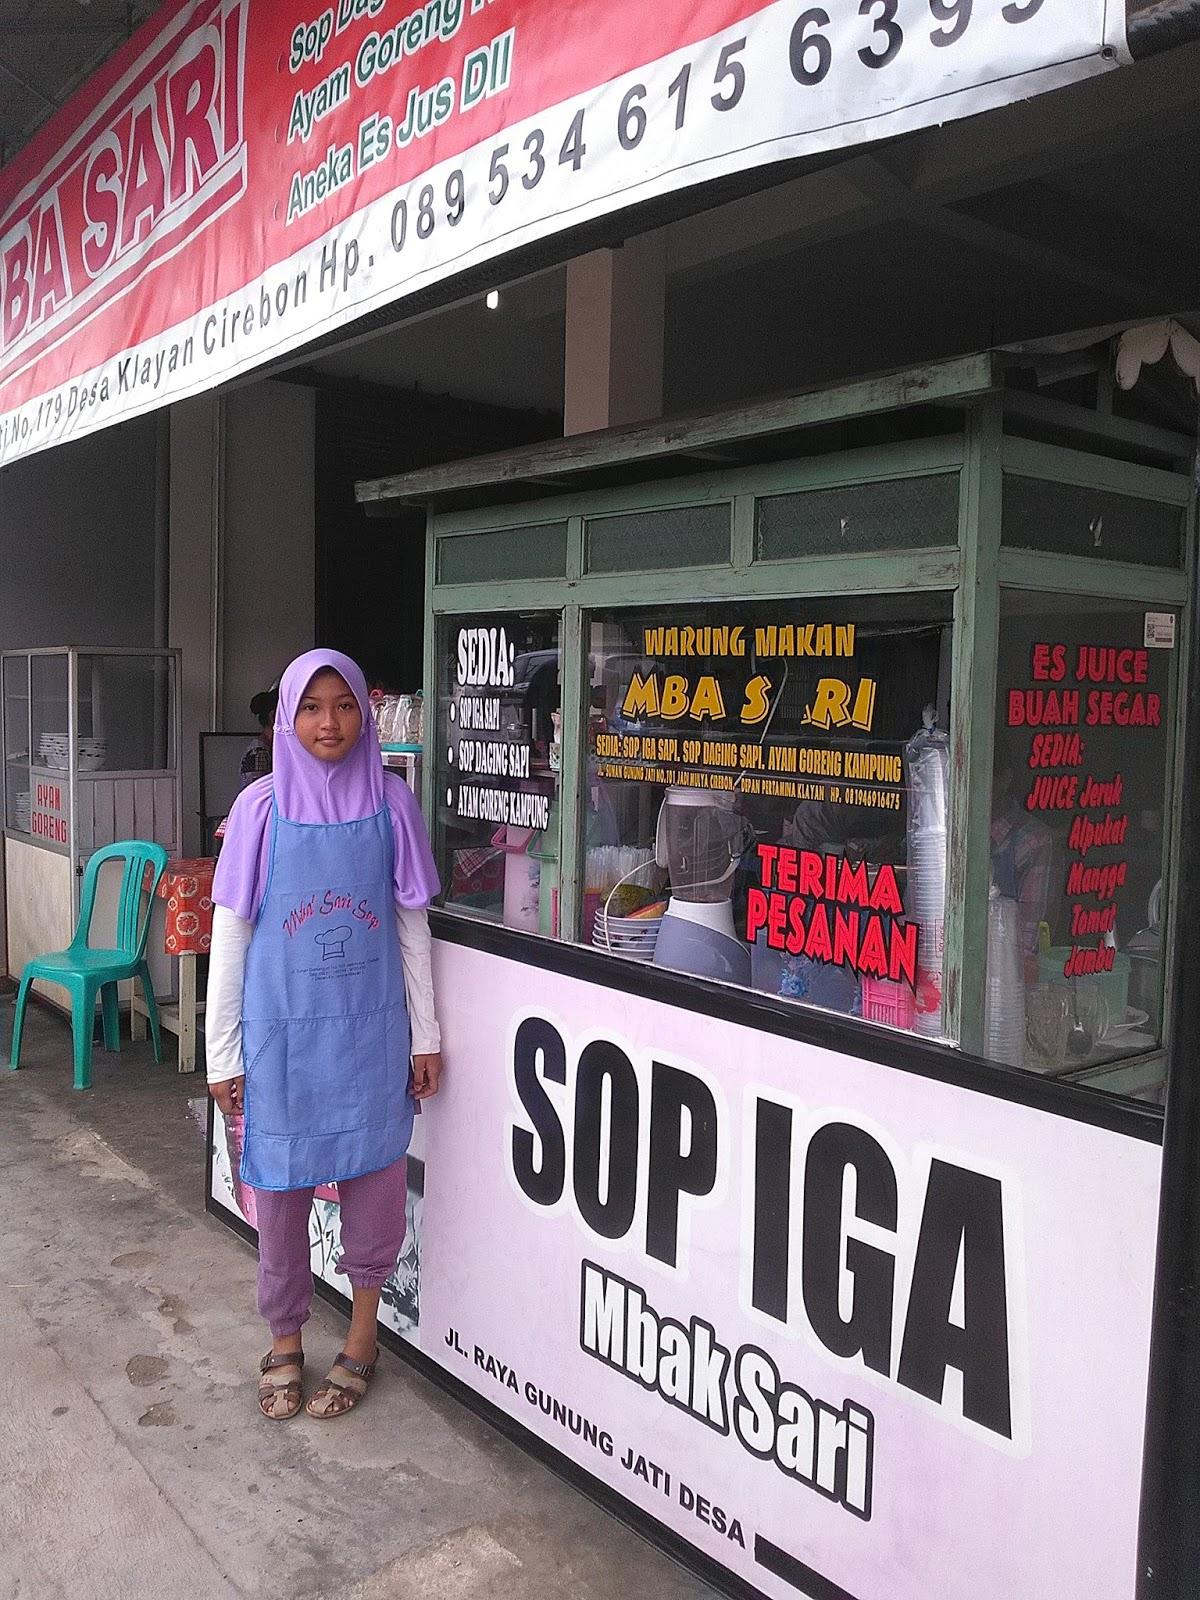 Sop Iga Sapi mbak Sari Cirebon